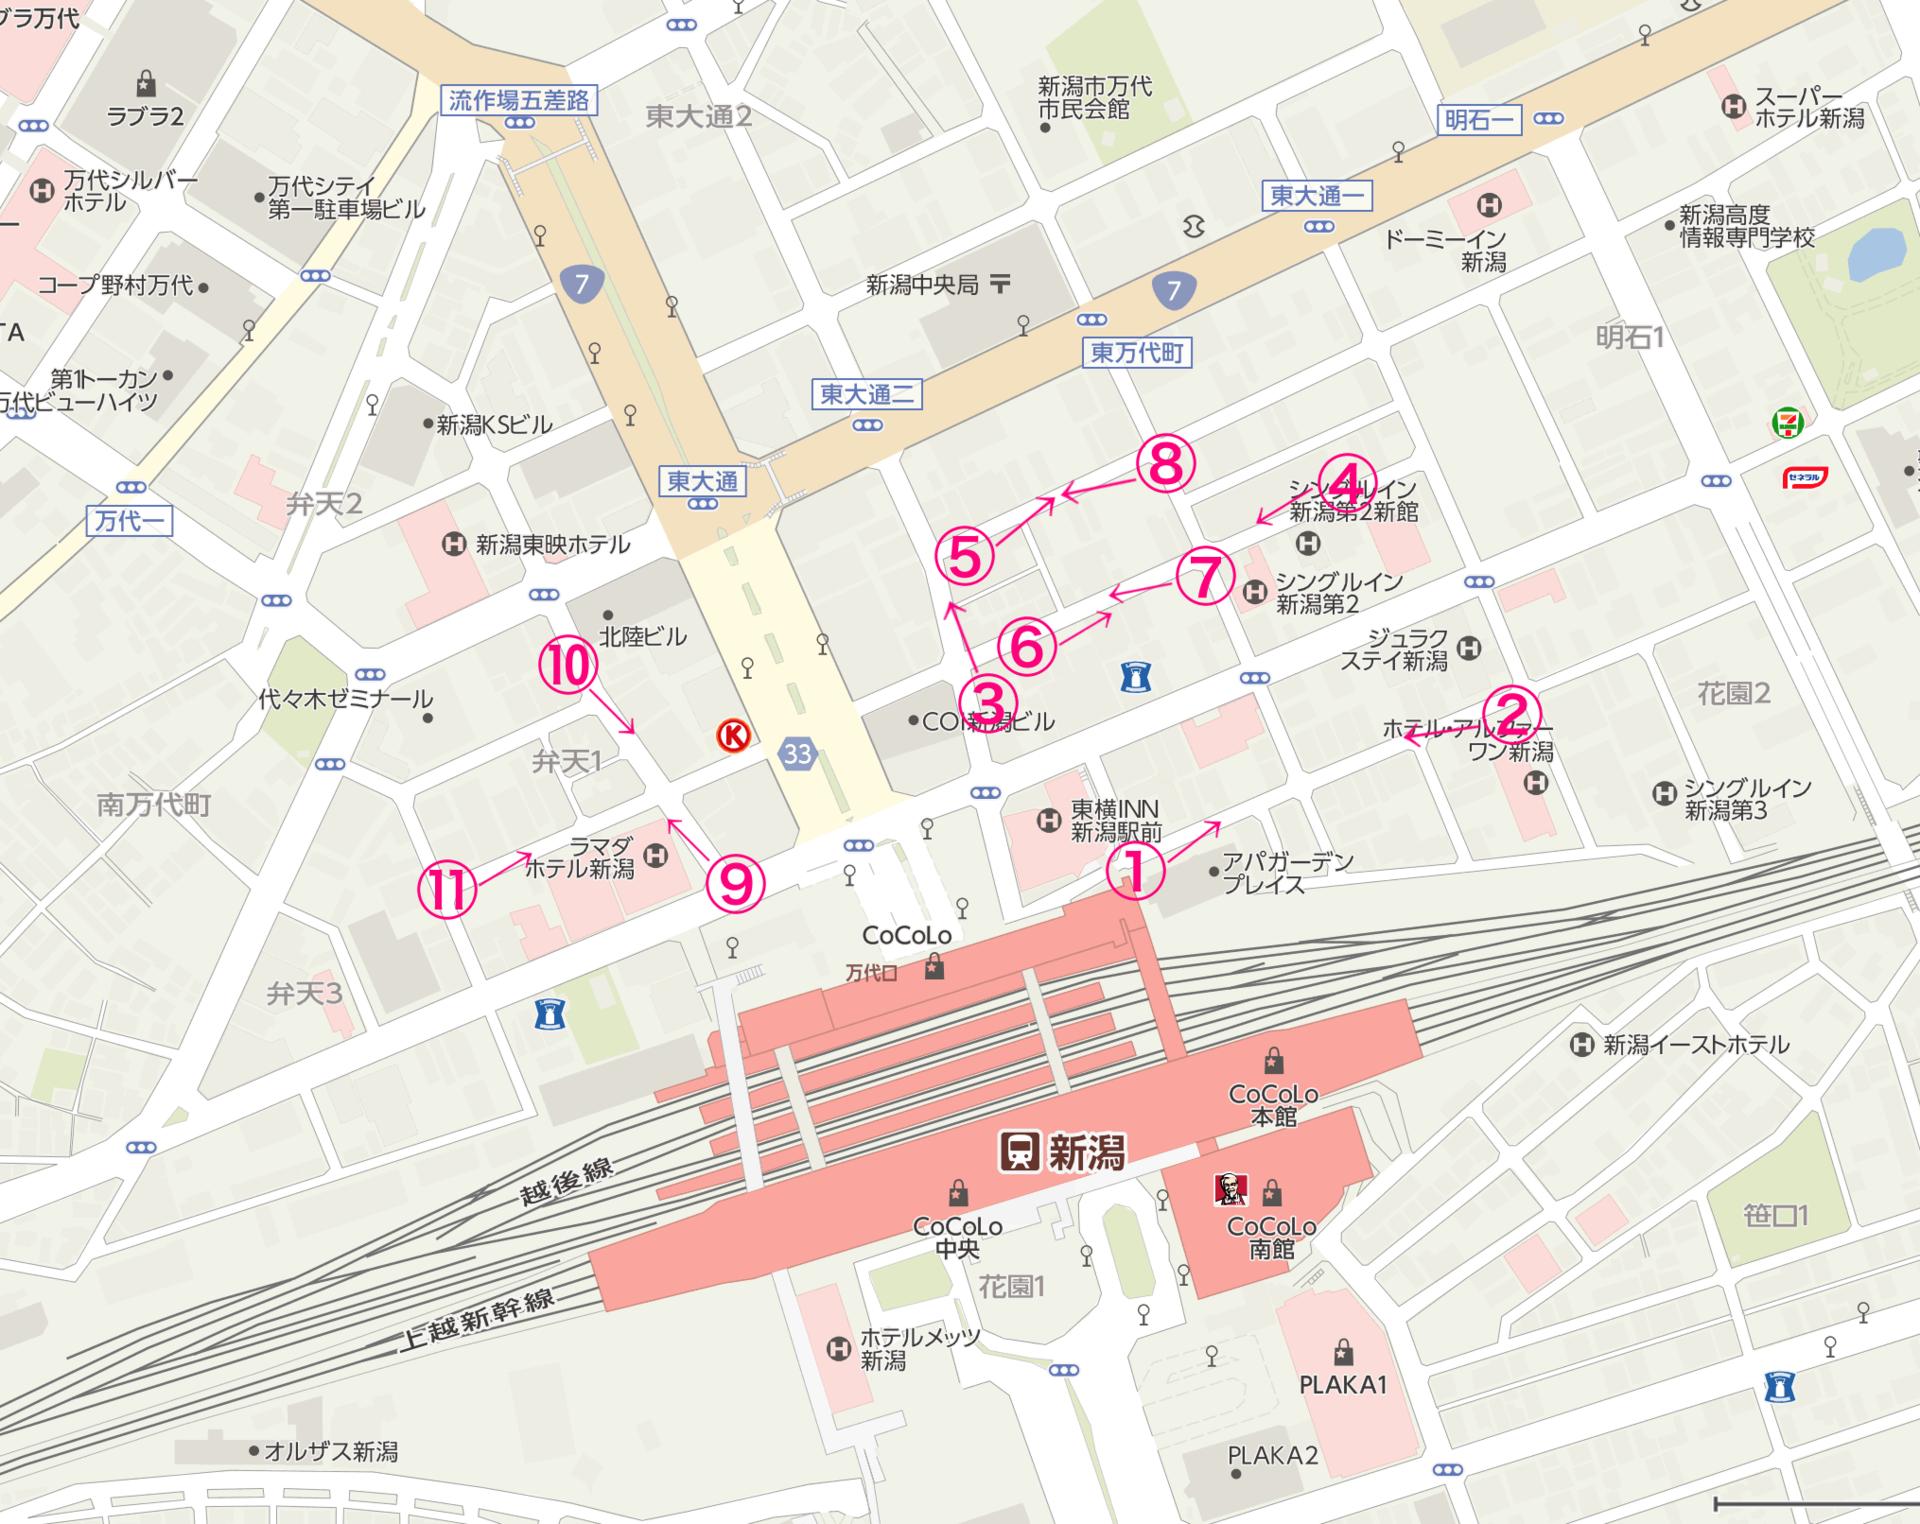 niigatasta_map_2.png